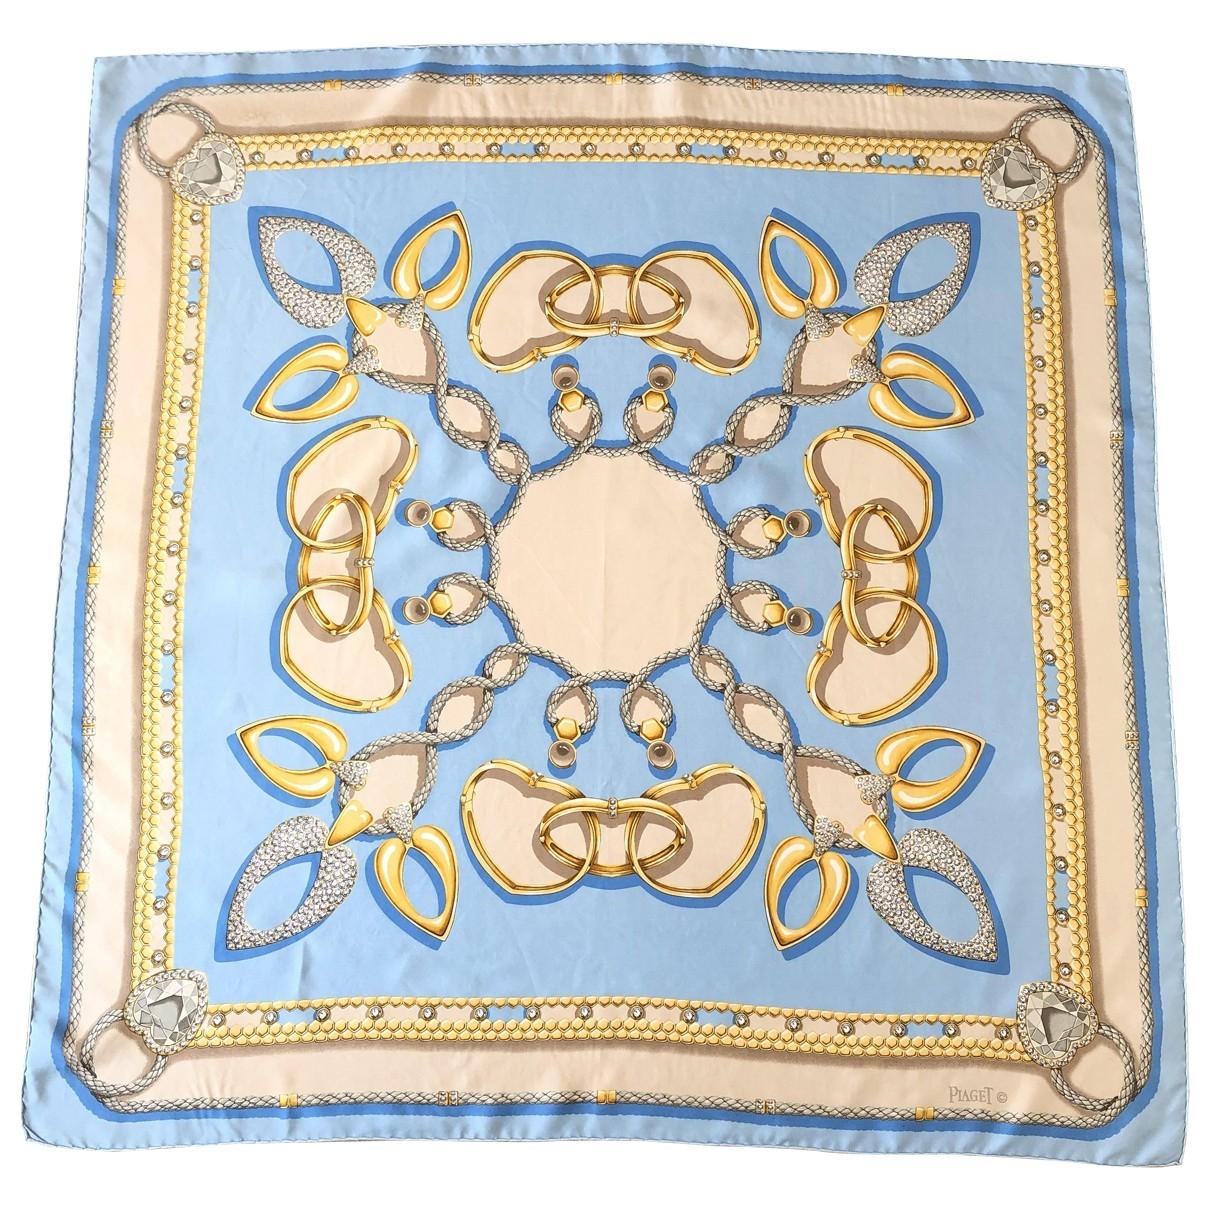 Piaget - Foulard   pour femme en soie - bleu